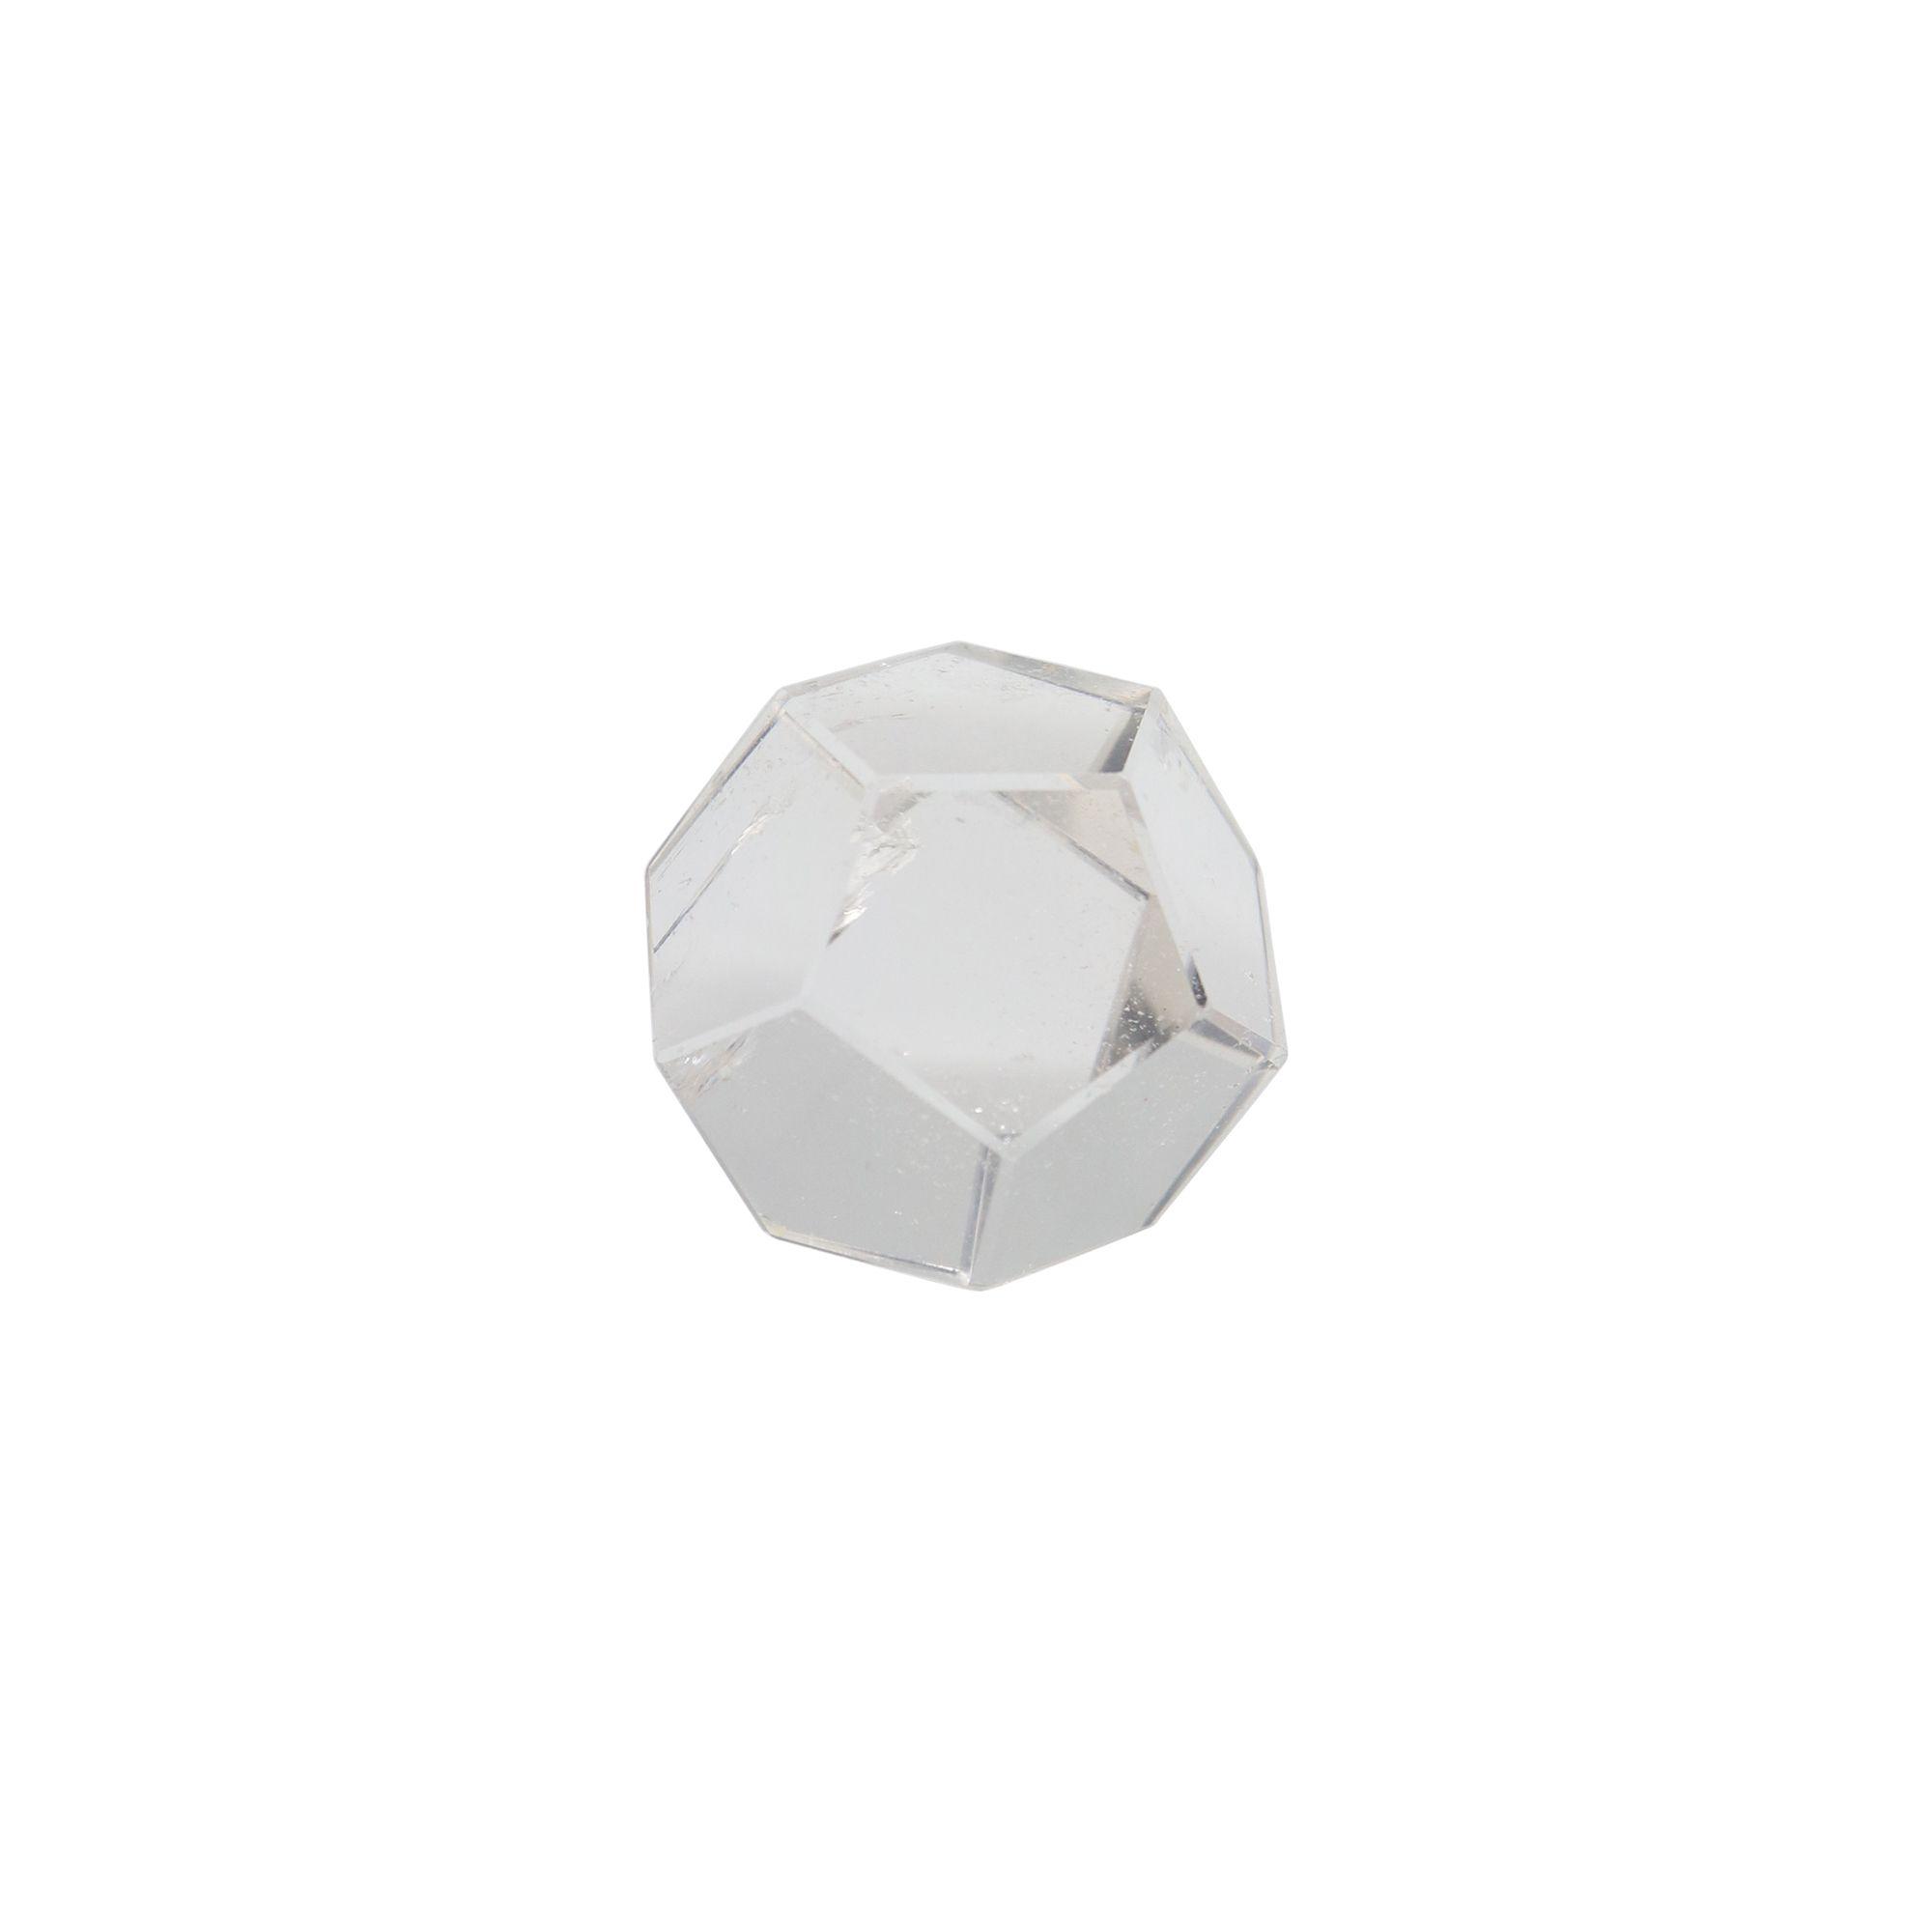 Cristal transparente Dodecaedro 26g - Polido